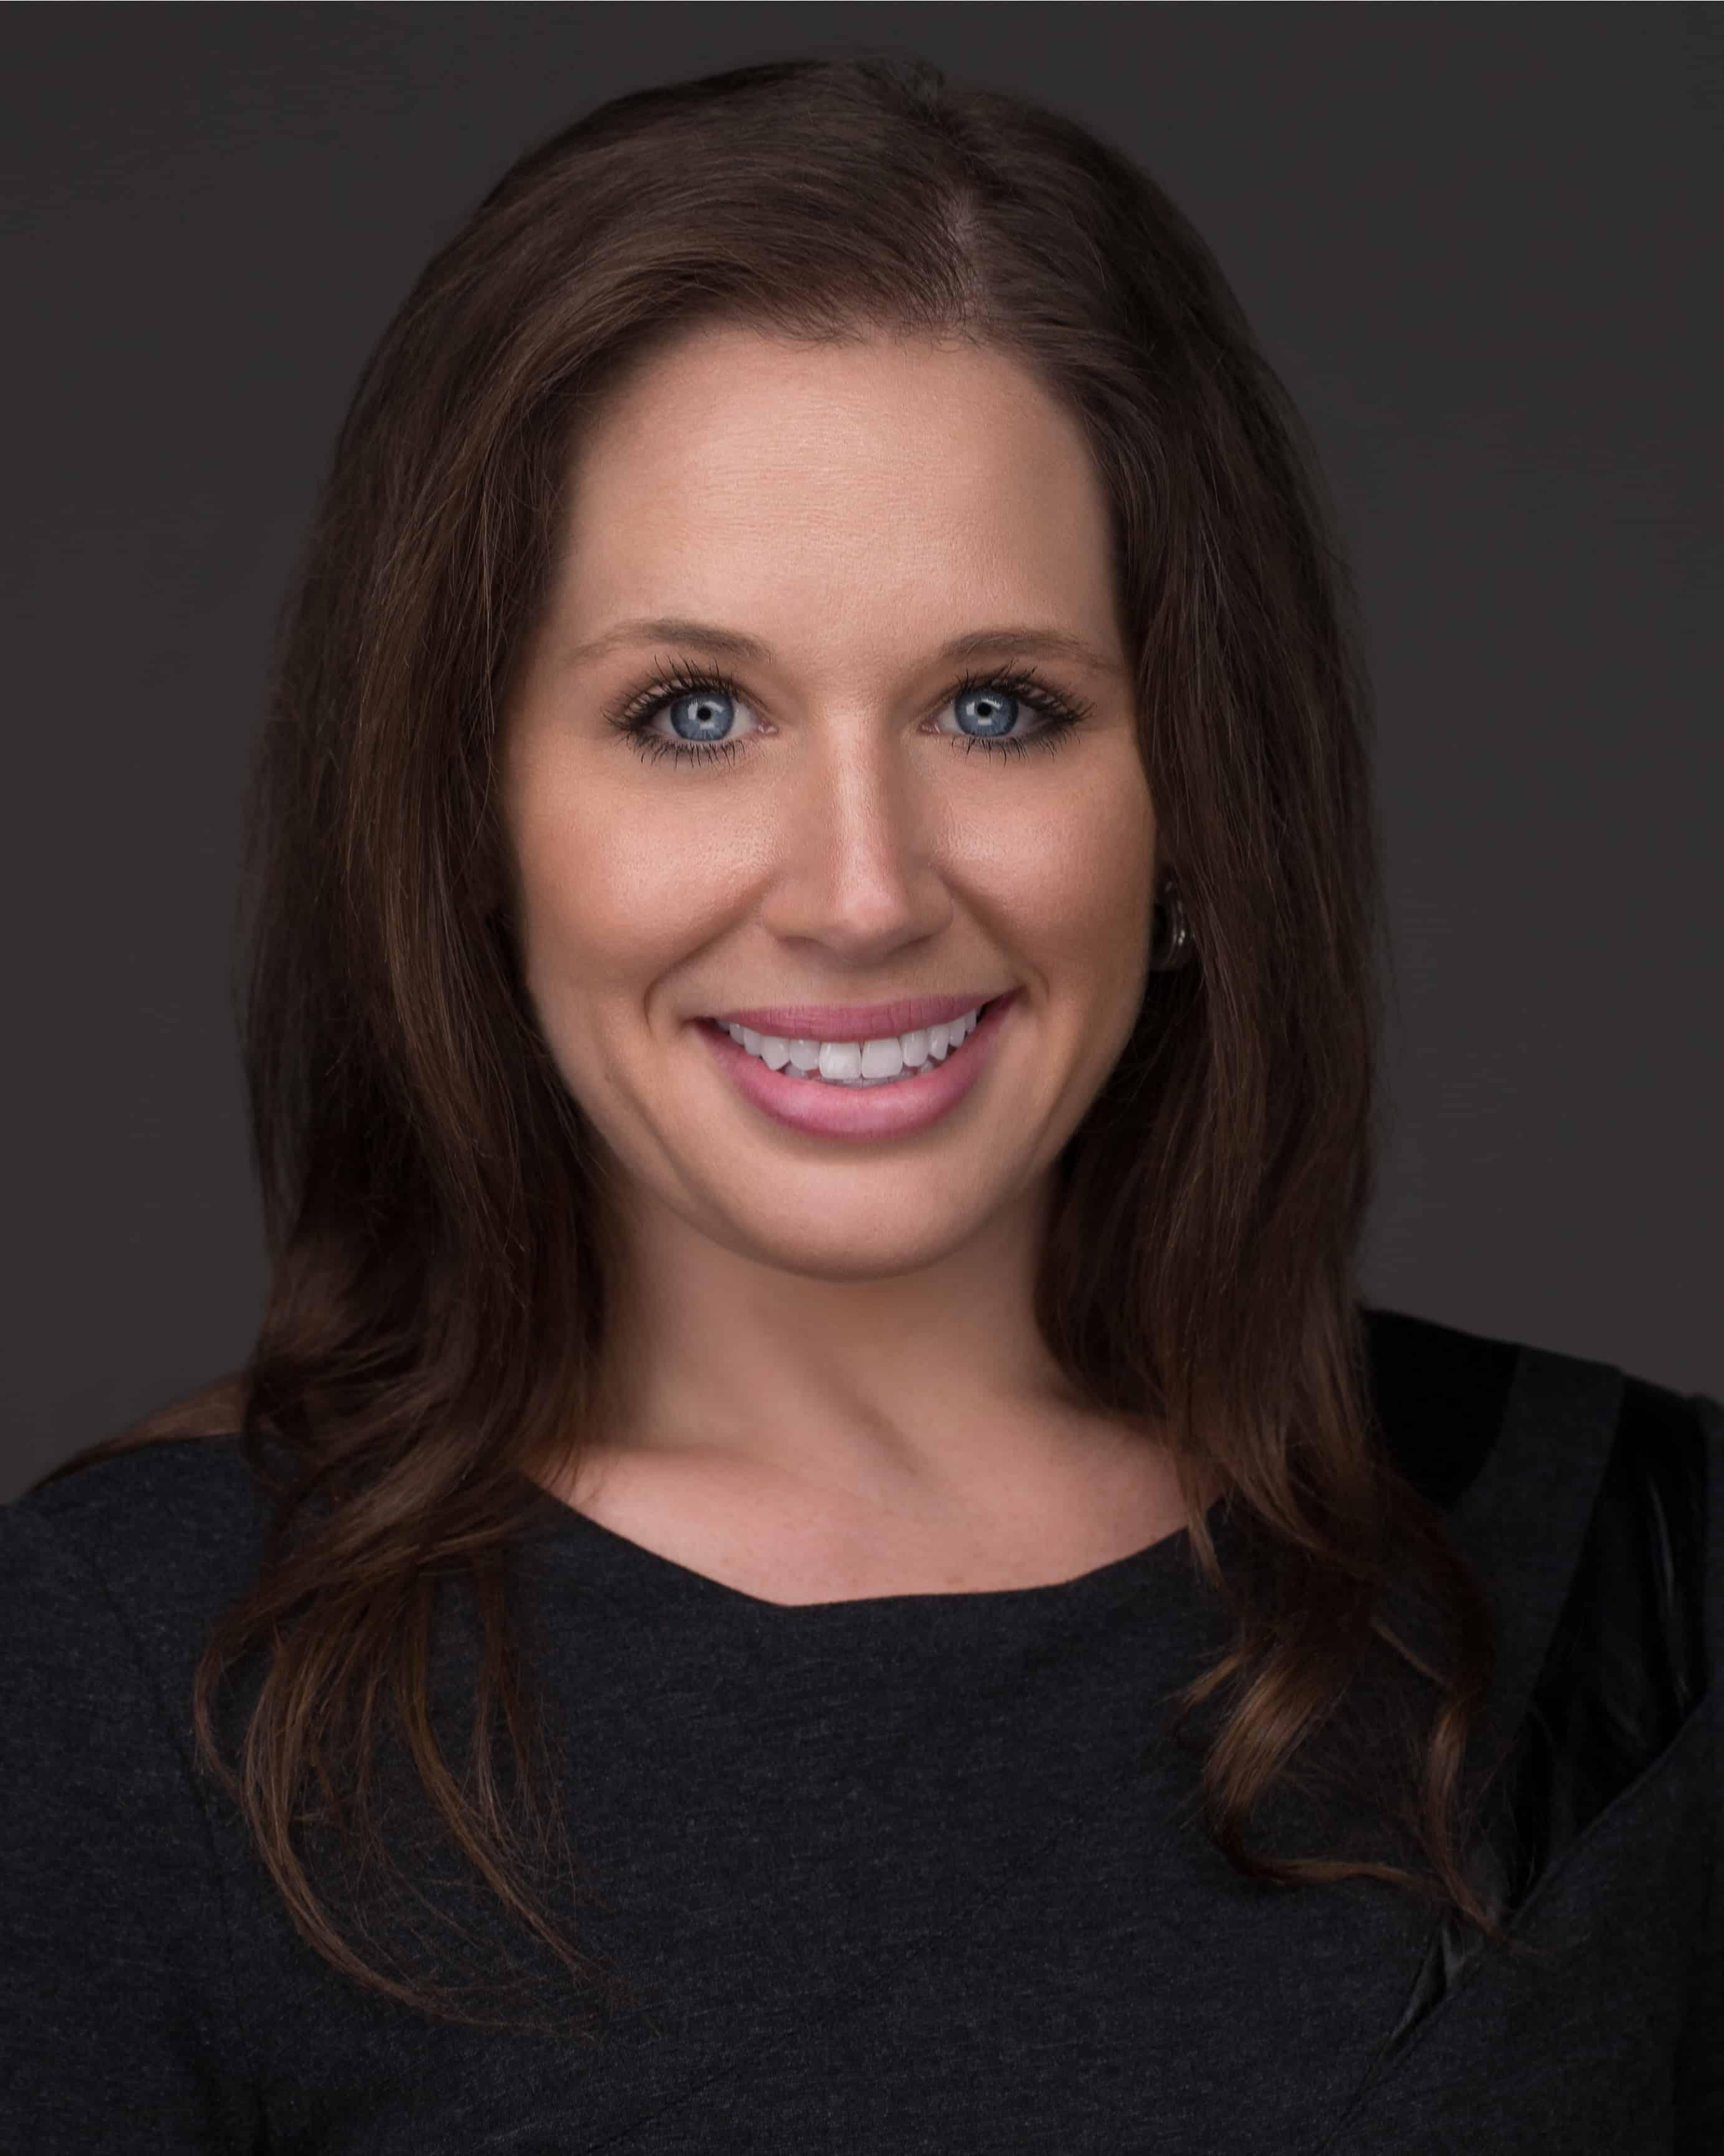 Paige Marquis